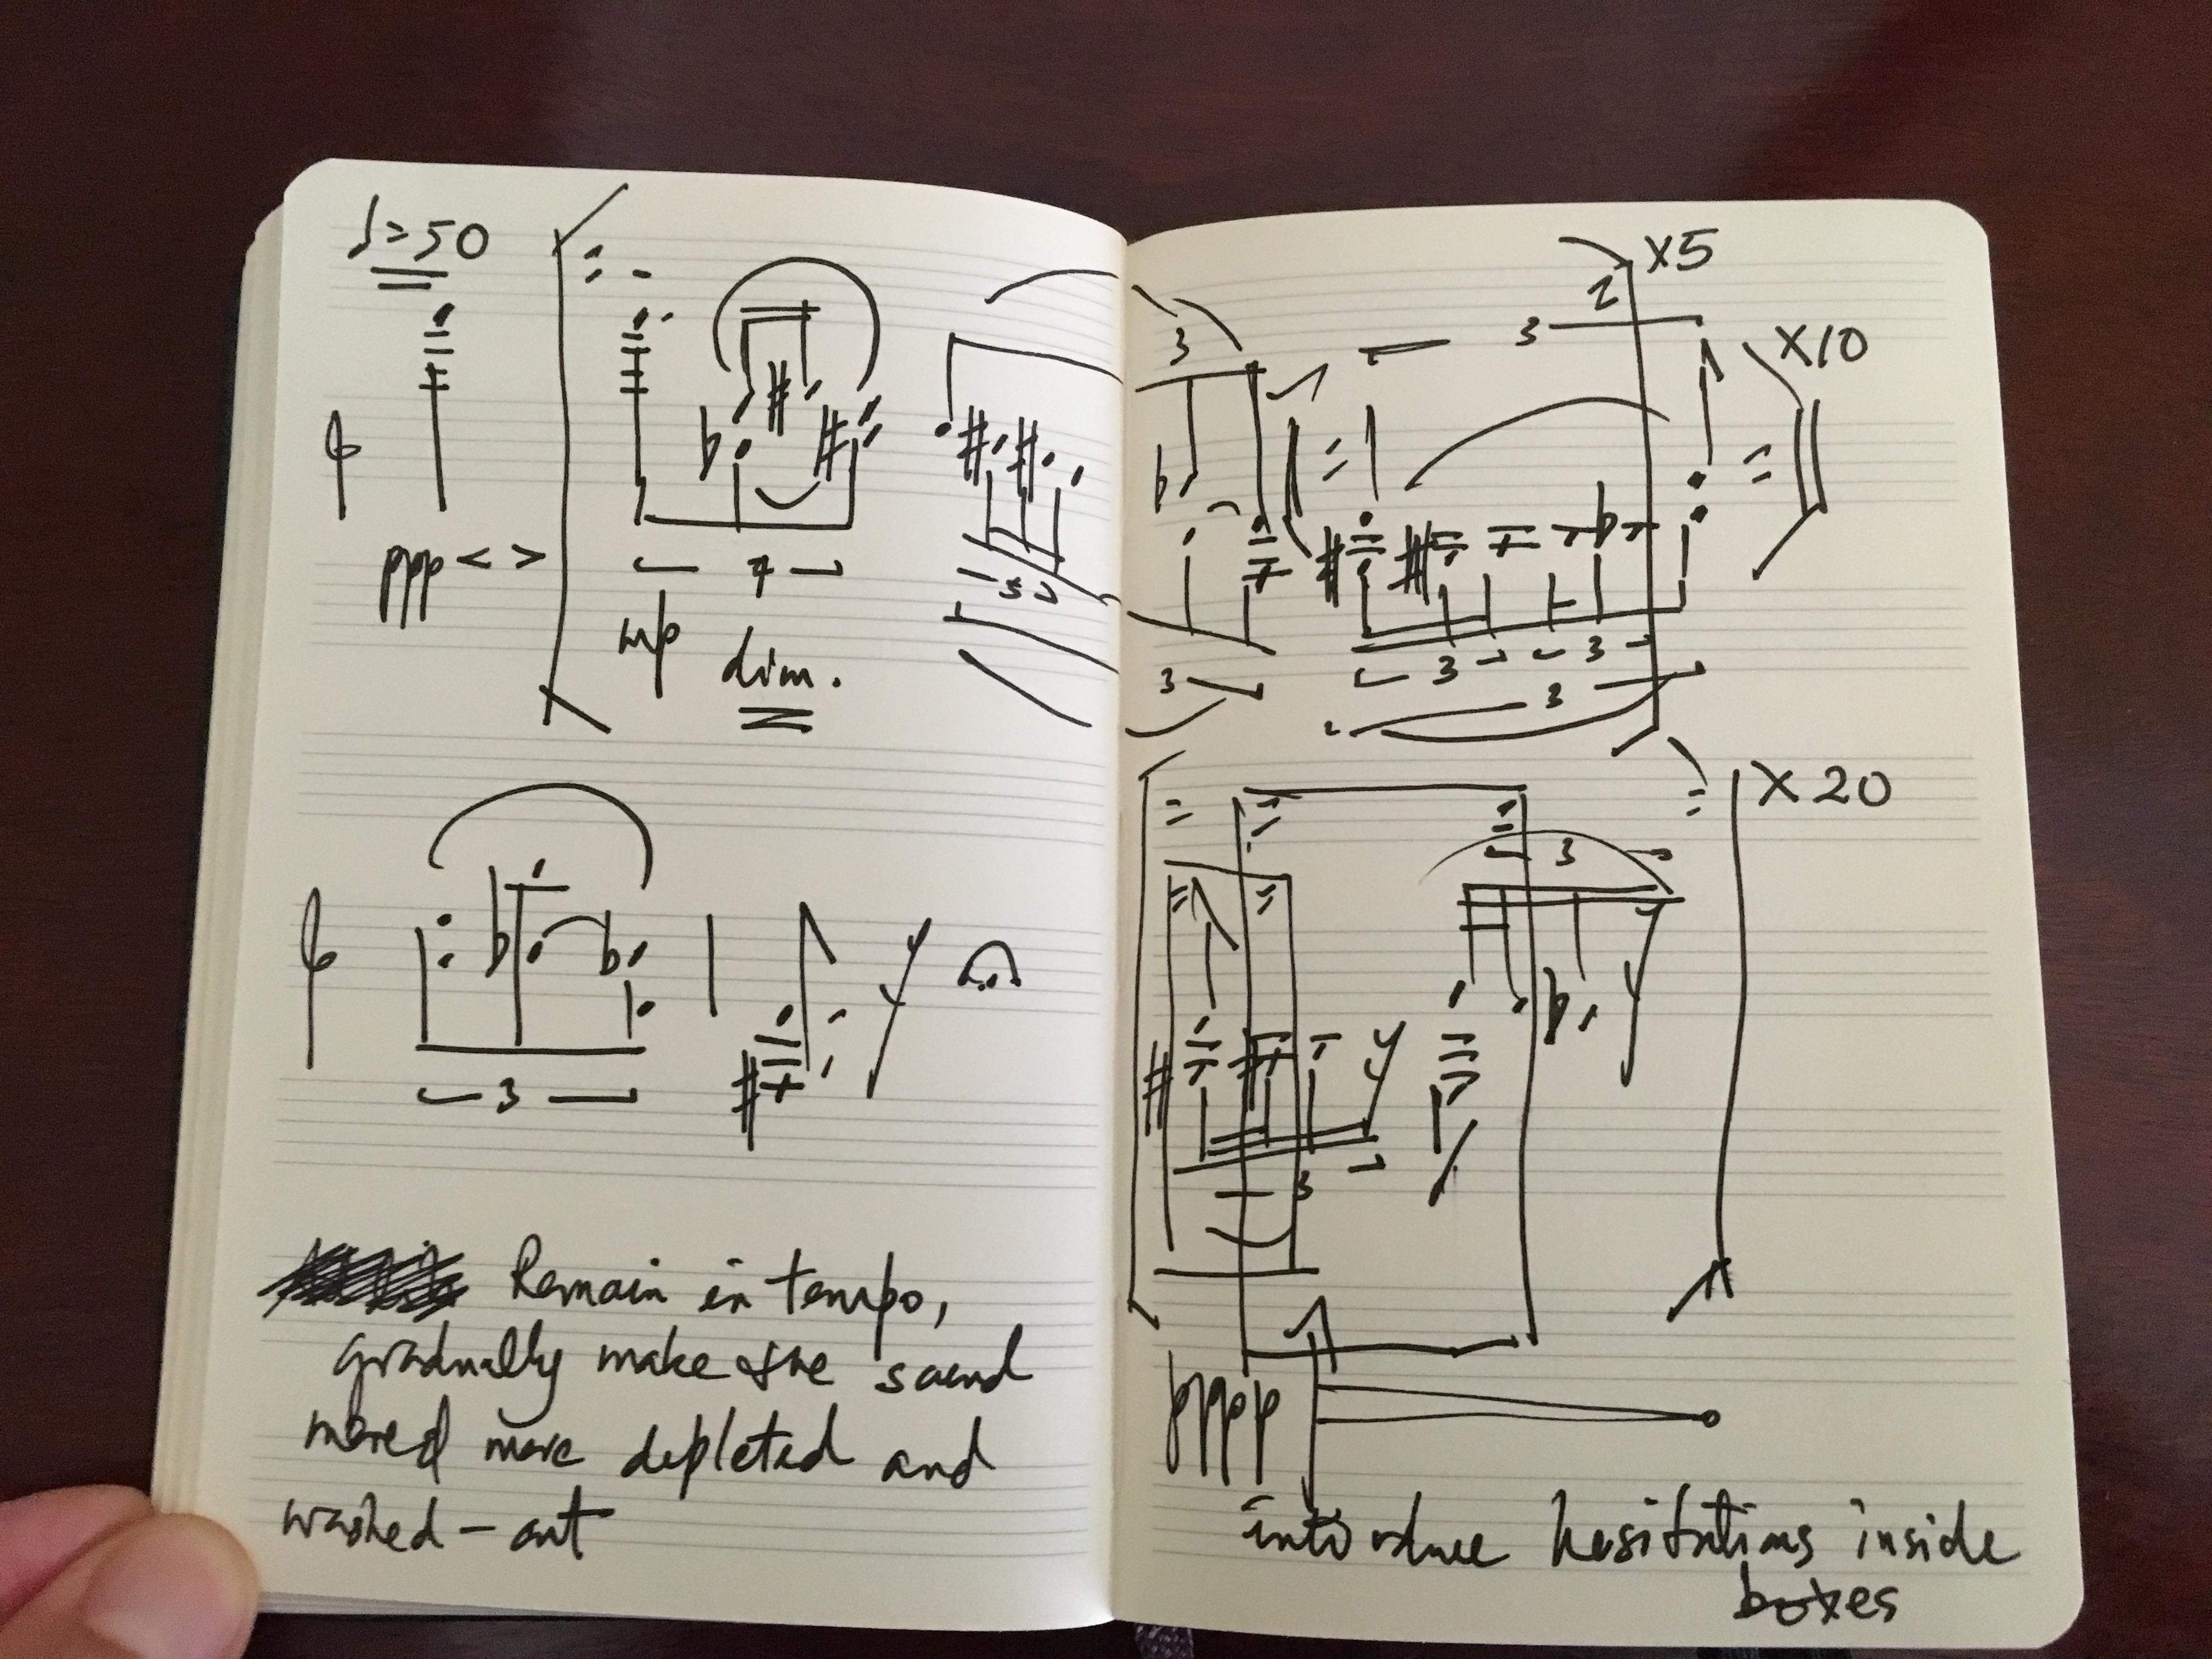 Emotional Lines In Art : Liza lim composer